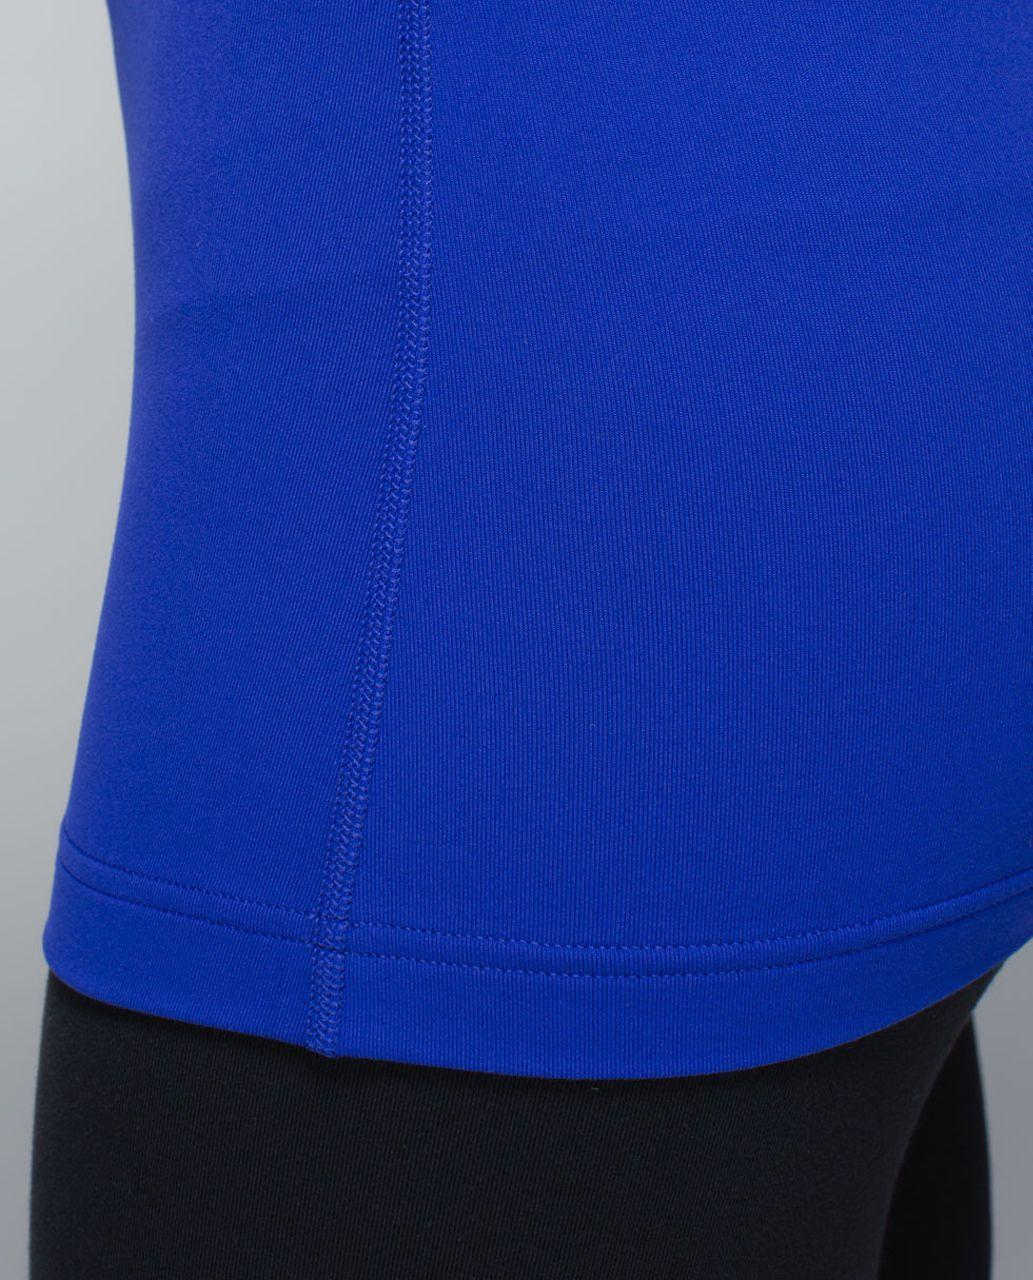 Lululemon Cool Racerback - Pigment Blue